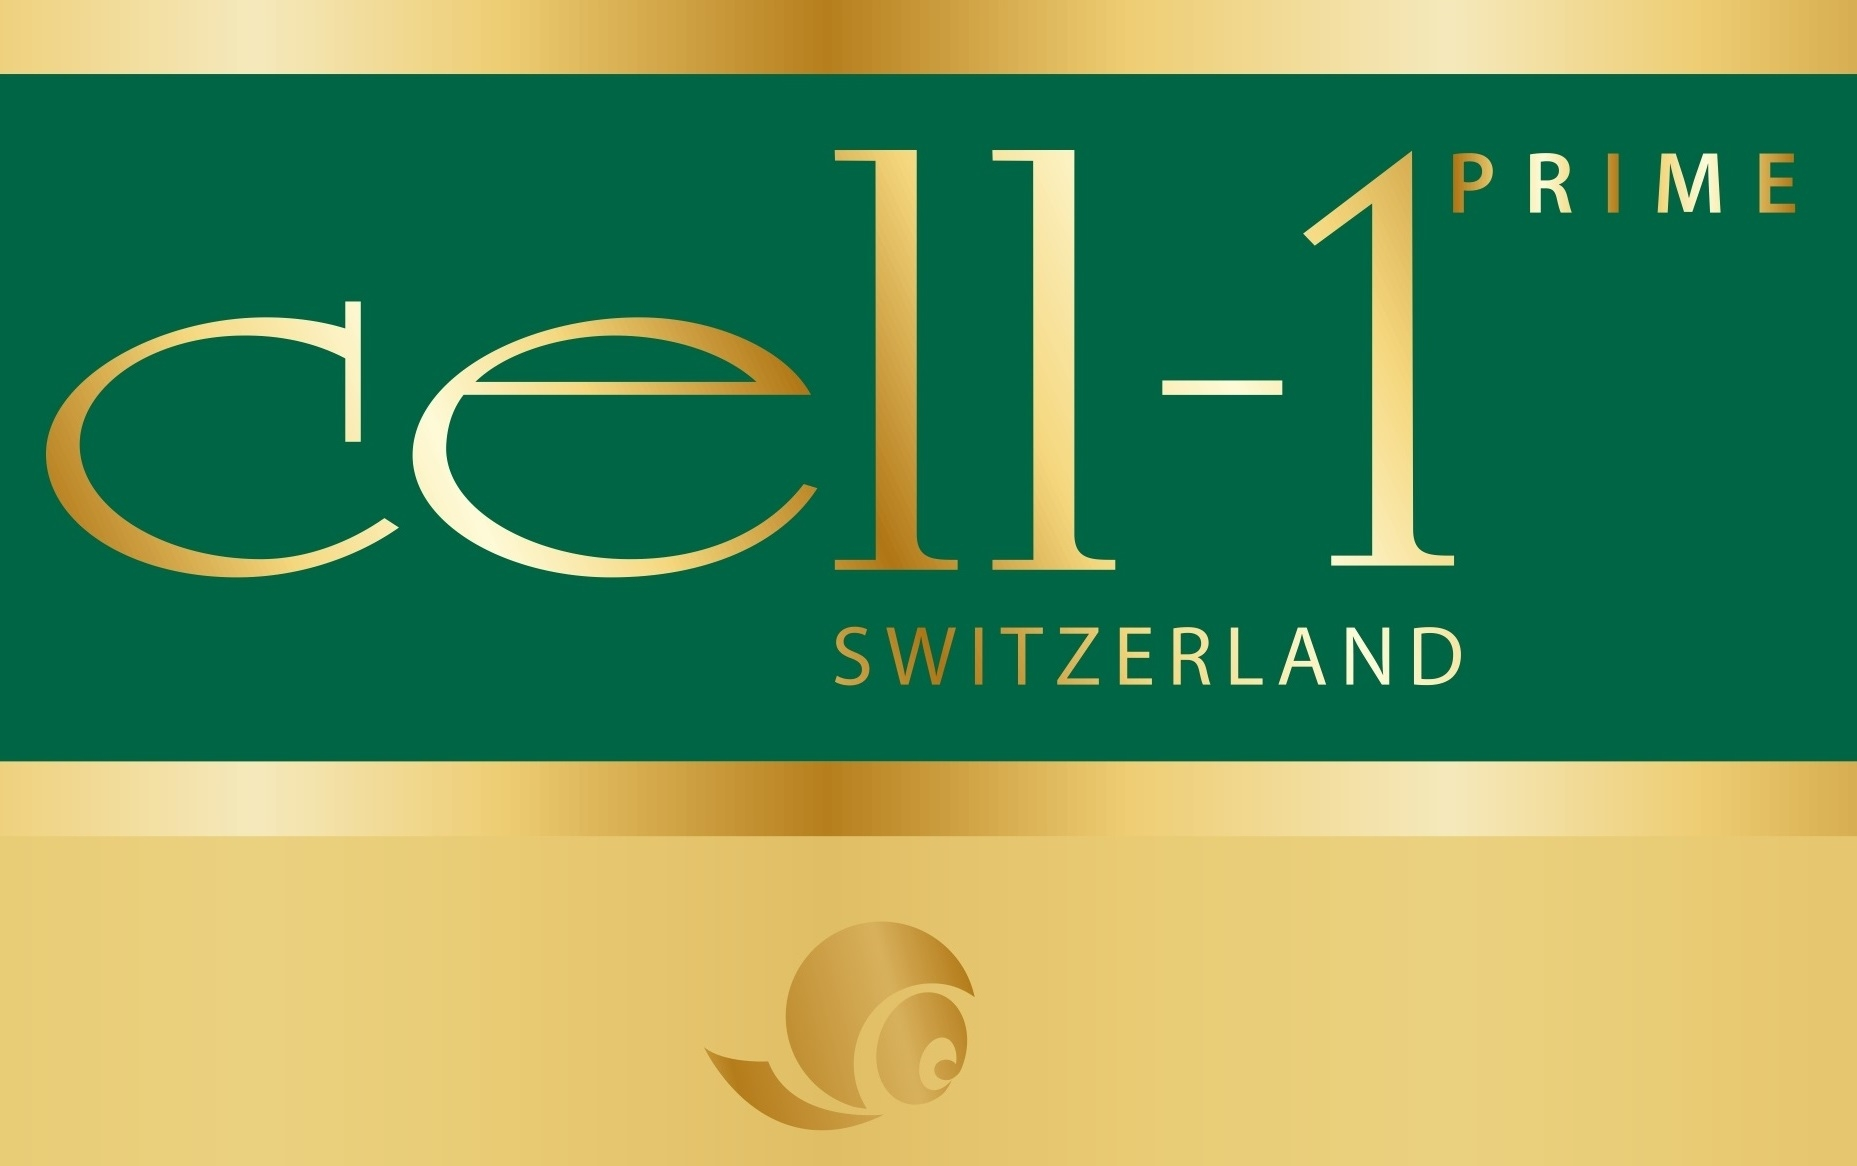 cell-1 PRIME SWITZERLAND